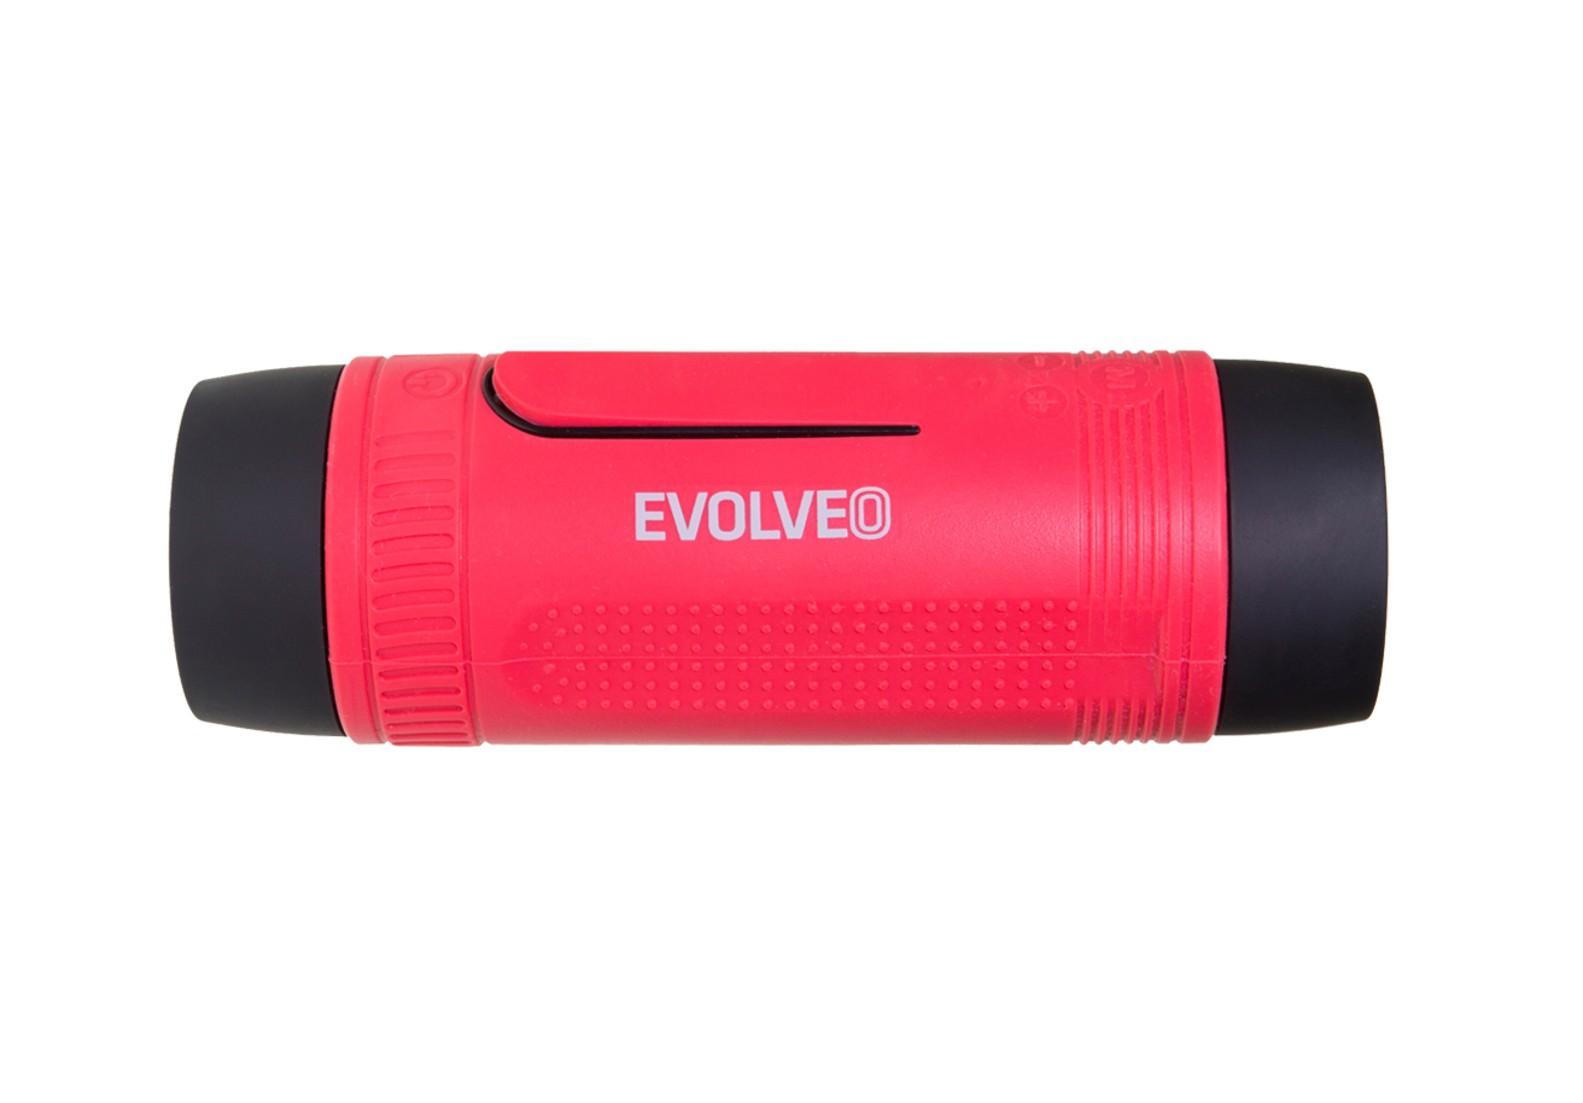 EVOLVEO Armor XL3, outdoorový Bluetooth reproduktor a MP3 přehrávač, BT4.0, LED svítilna, červený